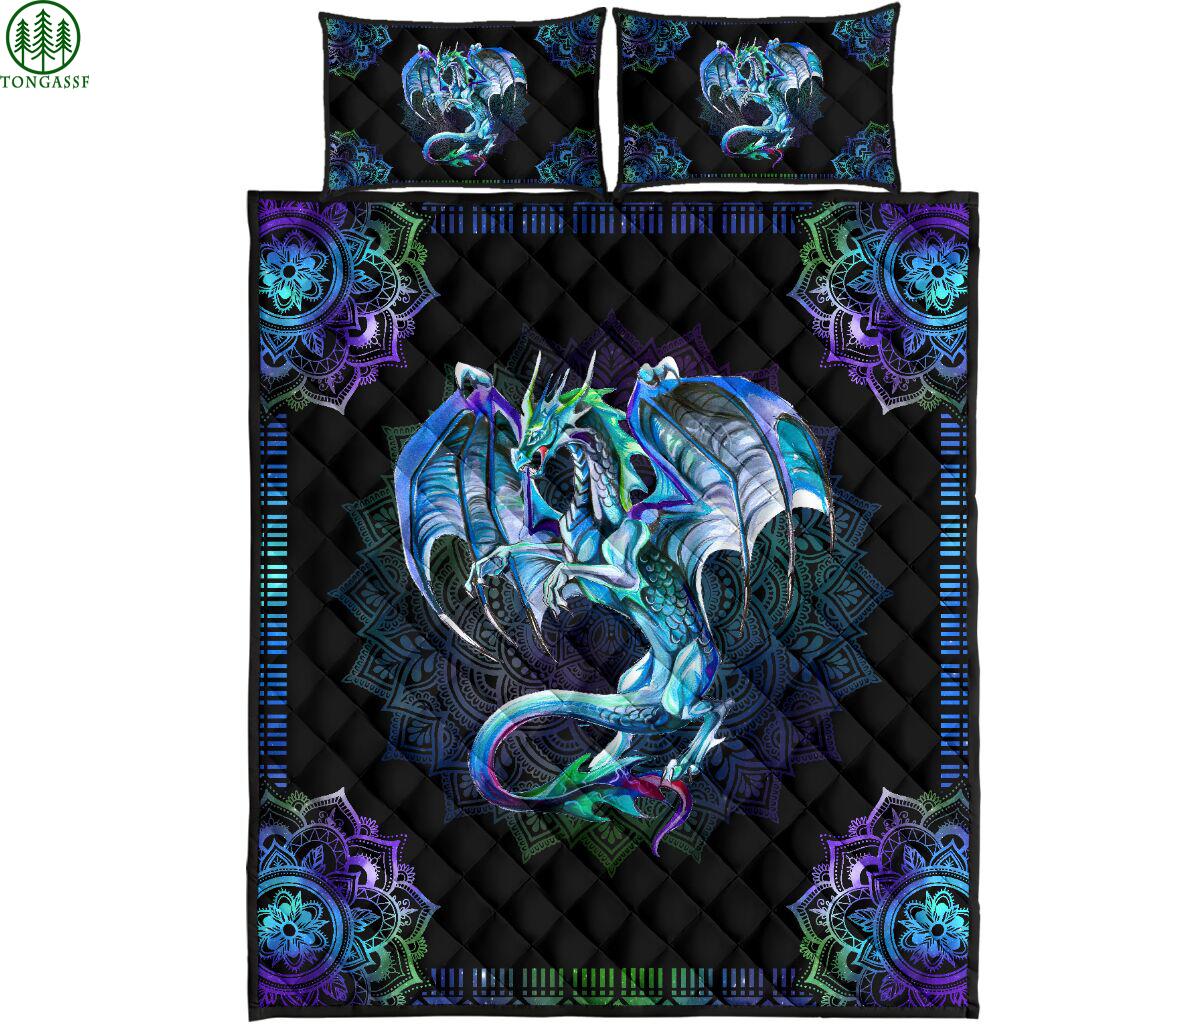 BLUE MAJESTIC DRAGON bedding set